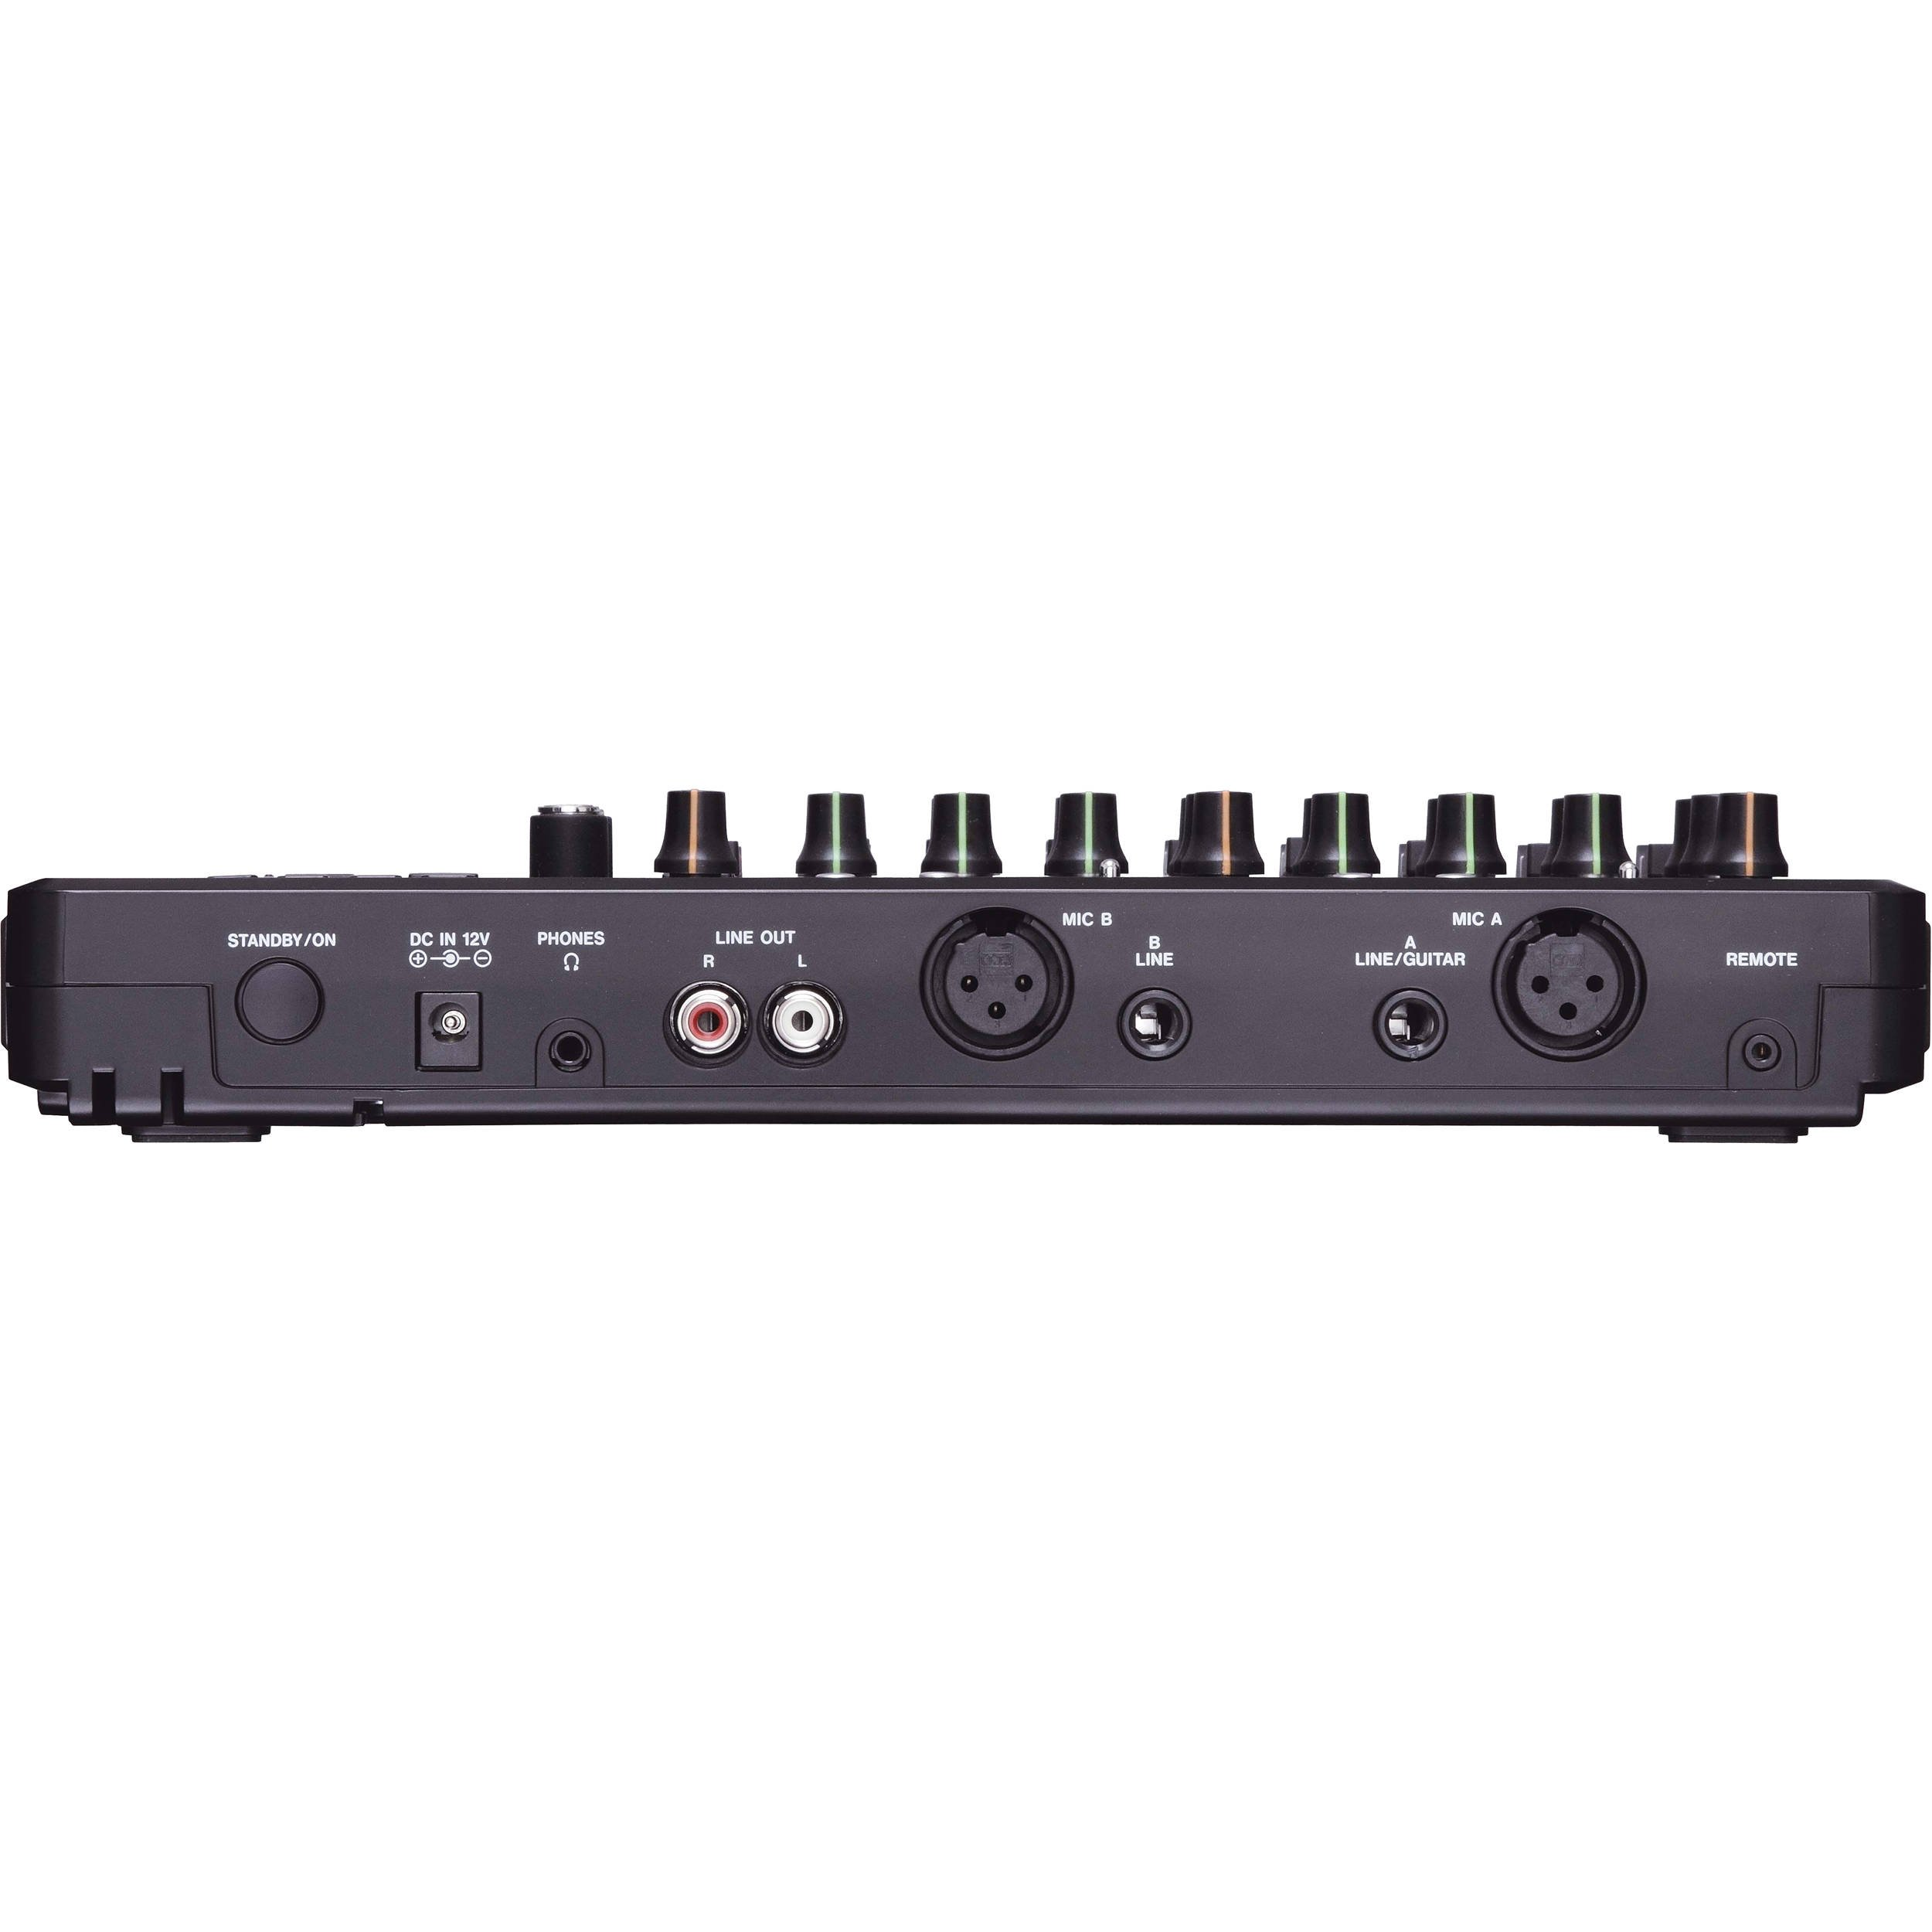 Tascam DP-03SD Digital Portastudio 8-Track Recorder with Samson Studio Headphones and Accessory Bundle by Photo Savings (Image #4)